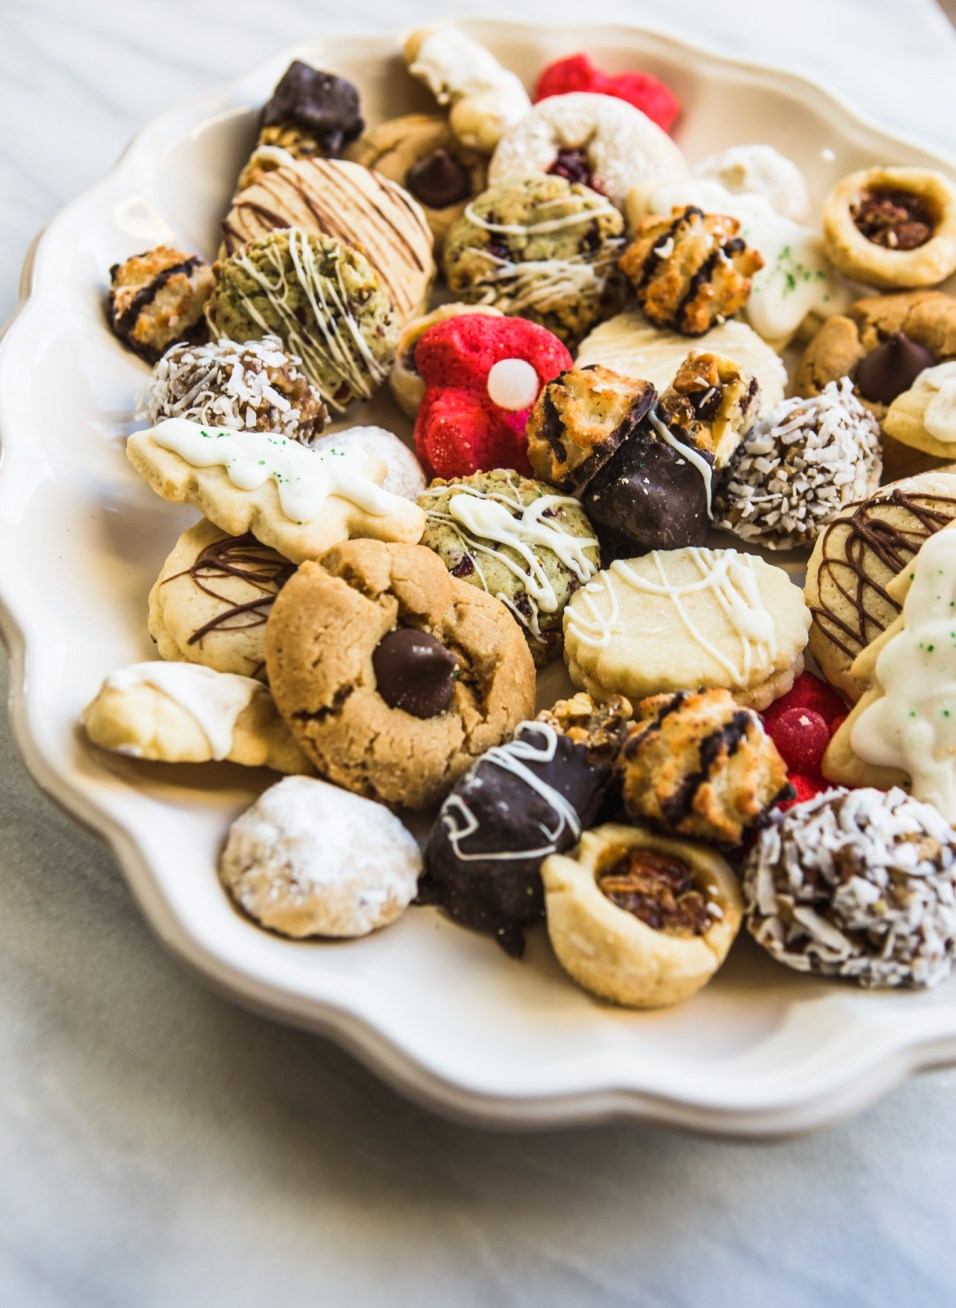 heinens_christmas_cookies_tableanddish-7651